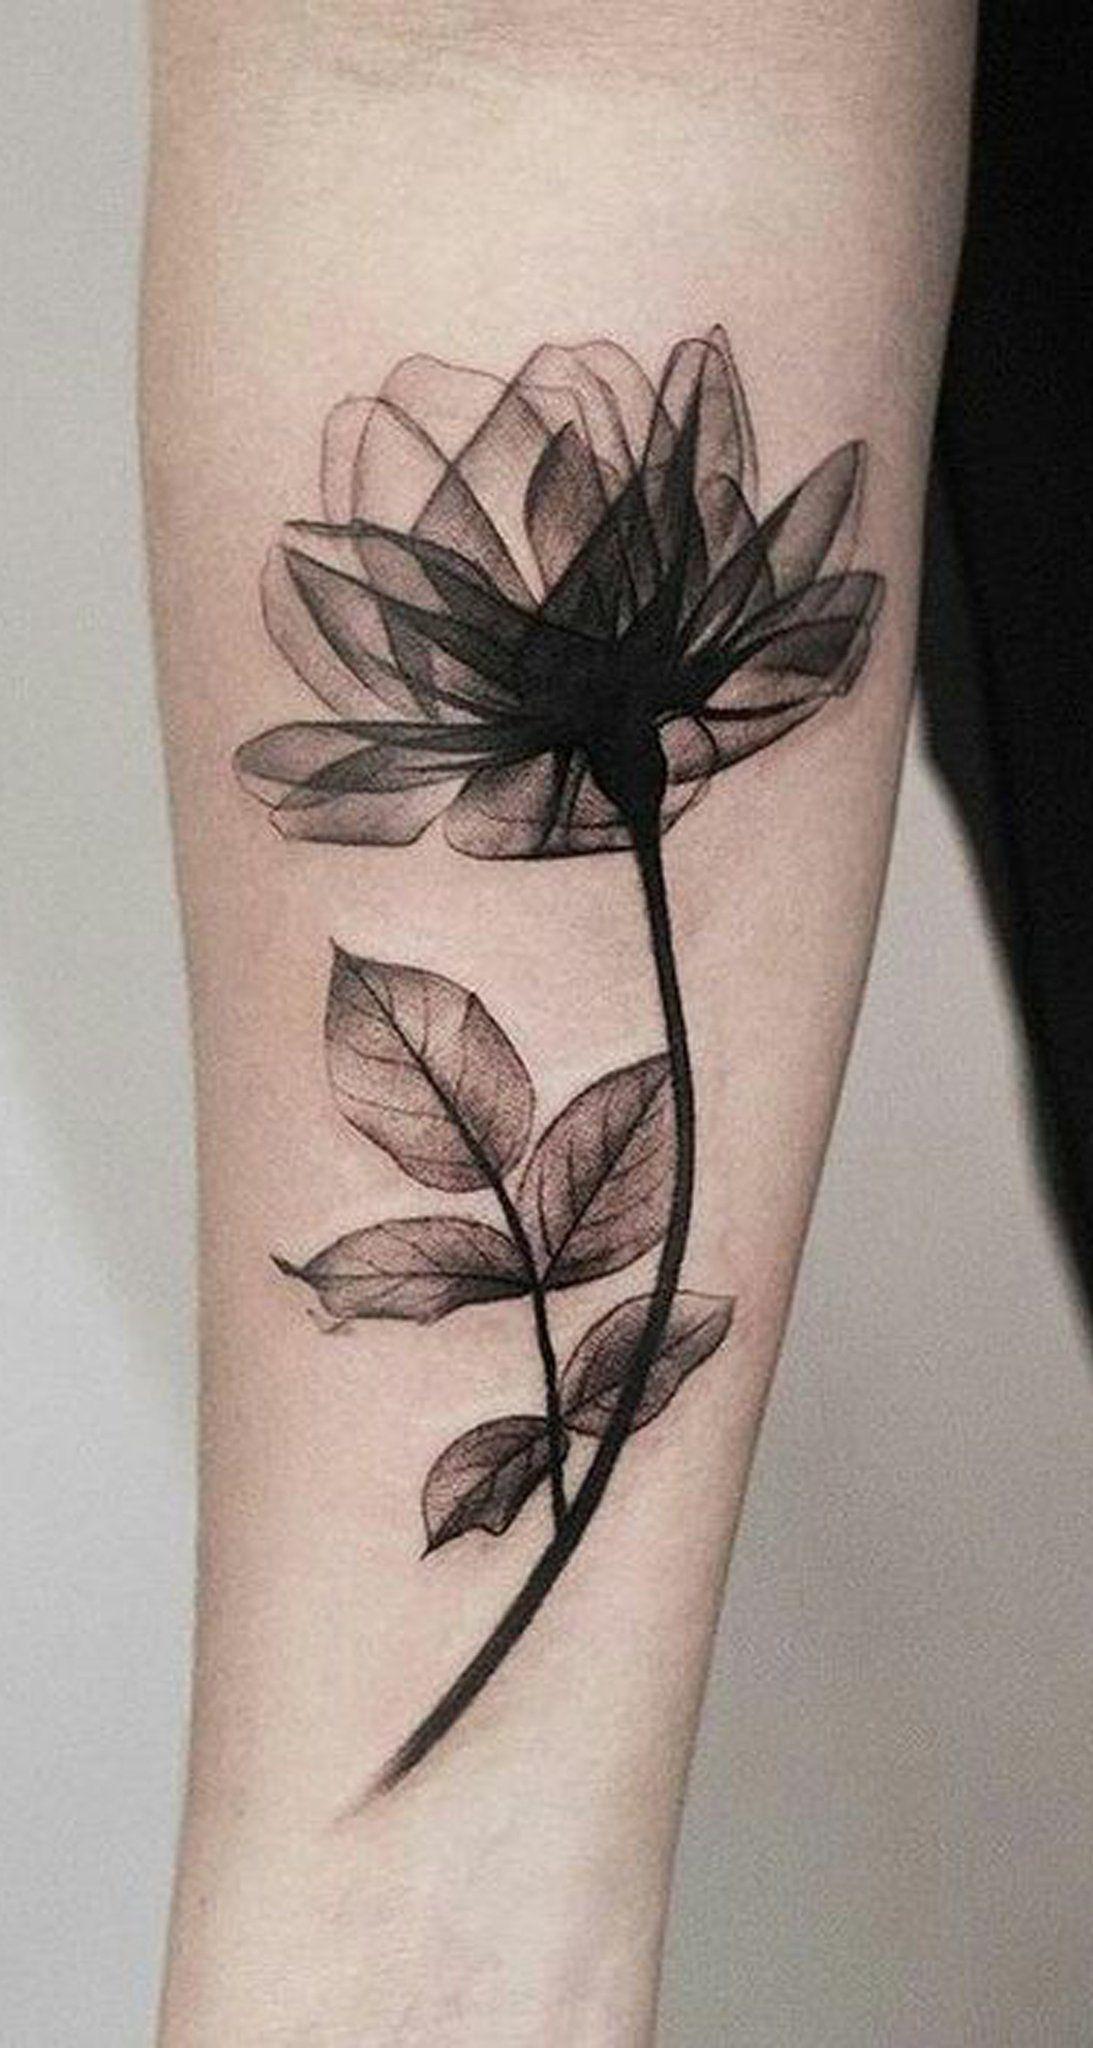 Beautiful Black Magnolia Arm Tattoo Ideas for Women ...